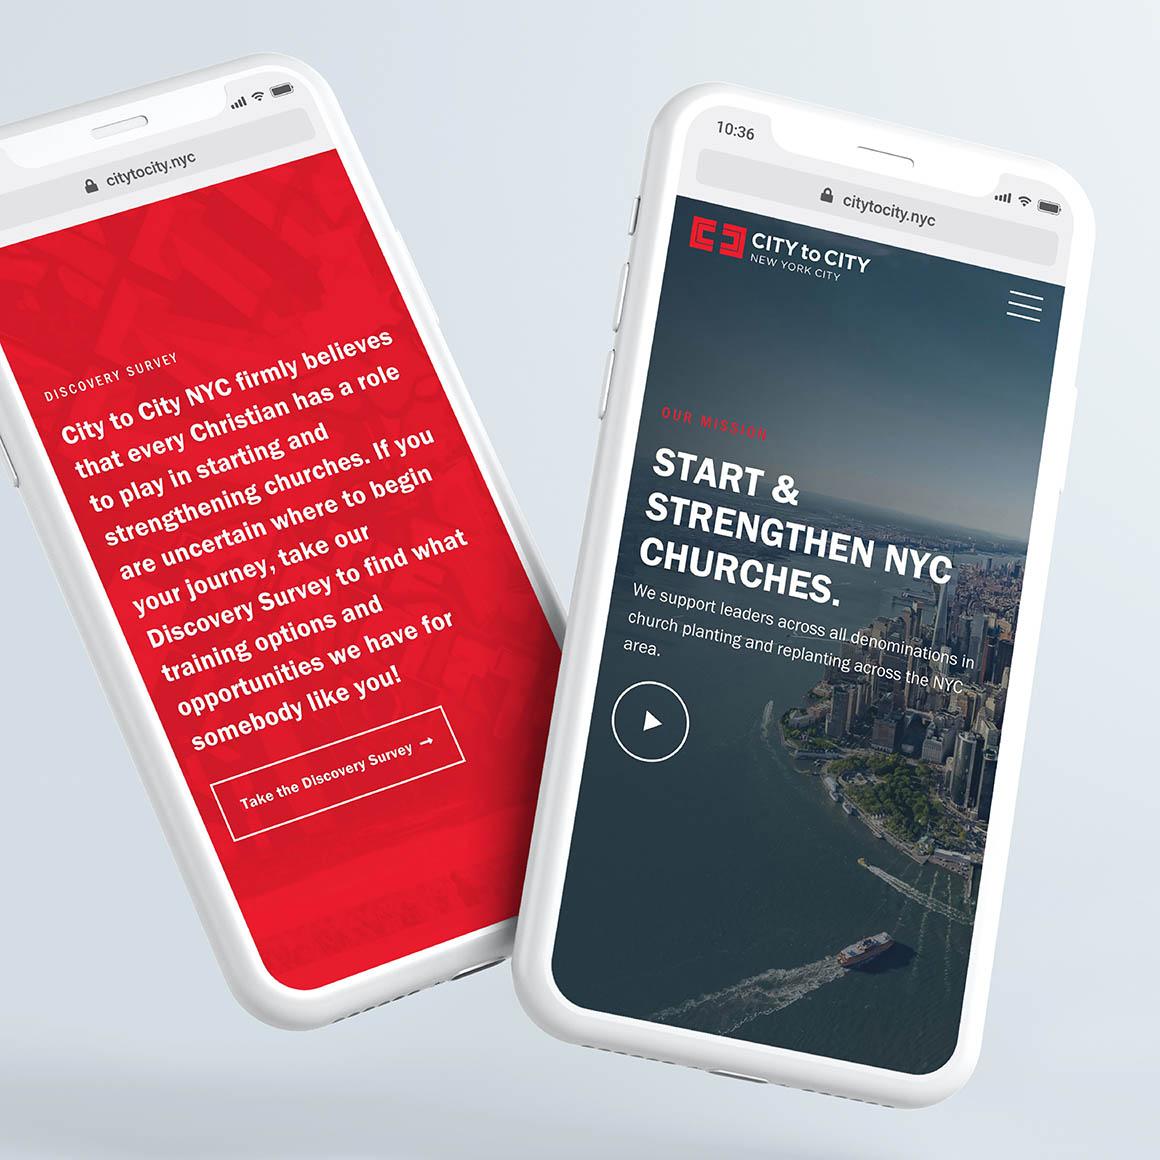 City to City NYC Website Phone Screens